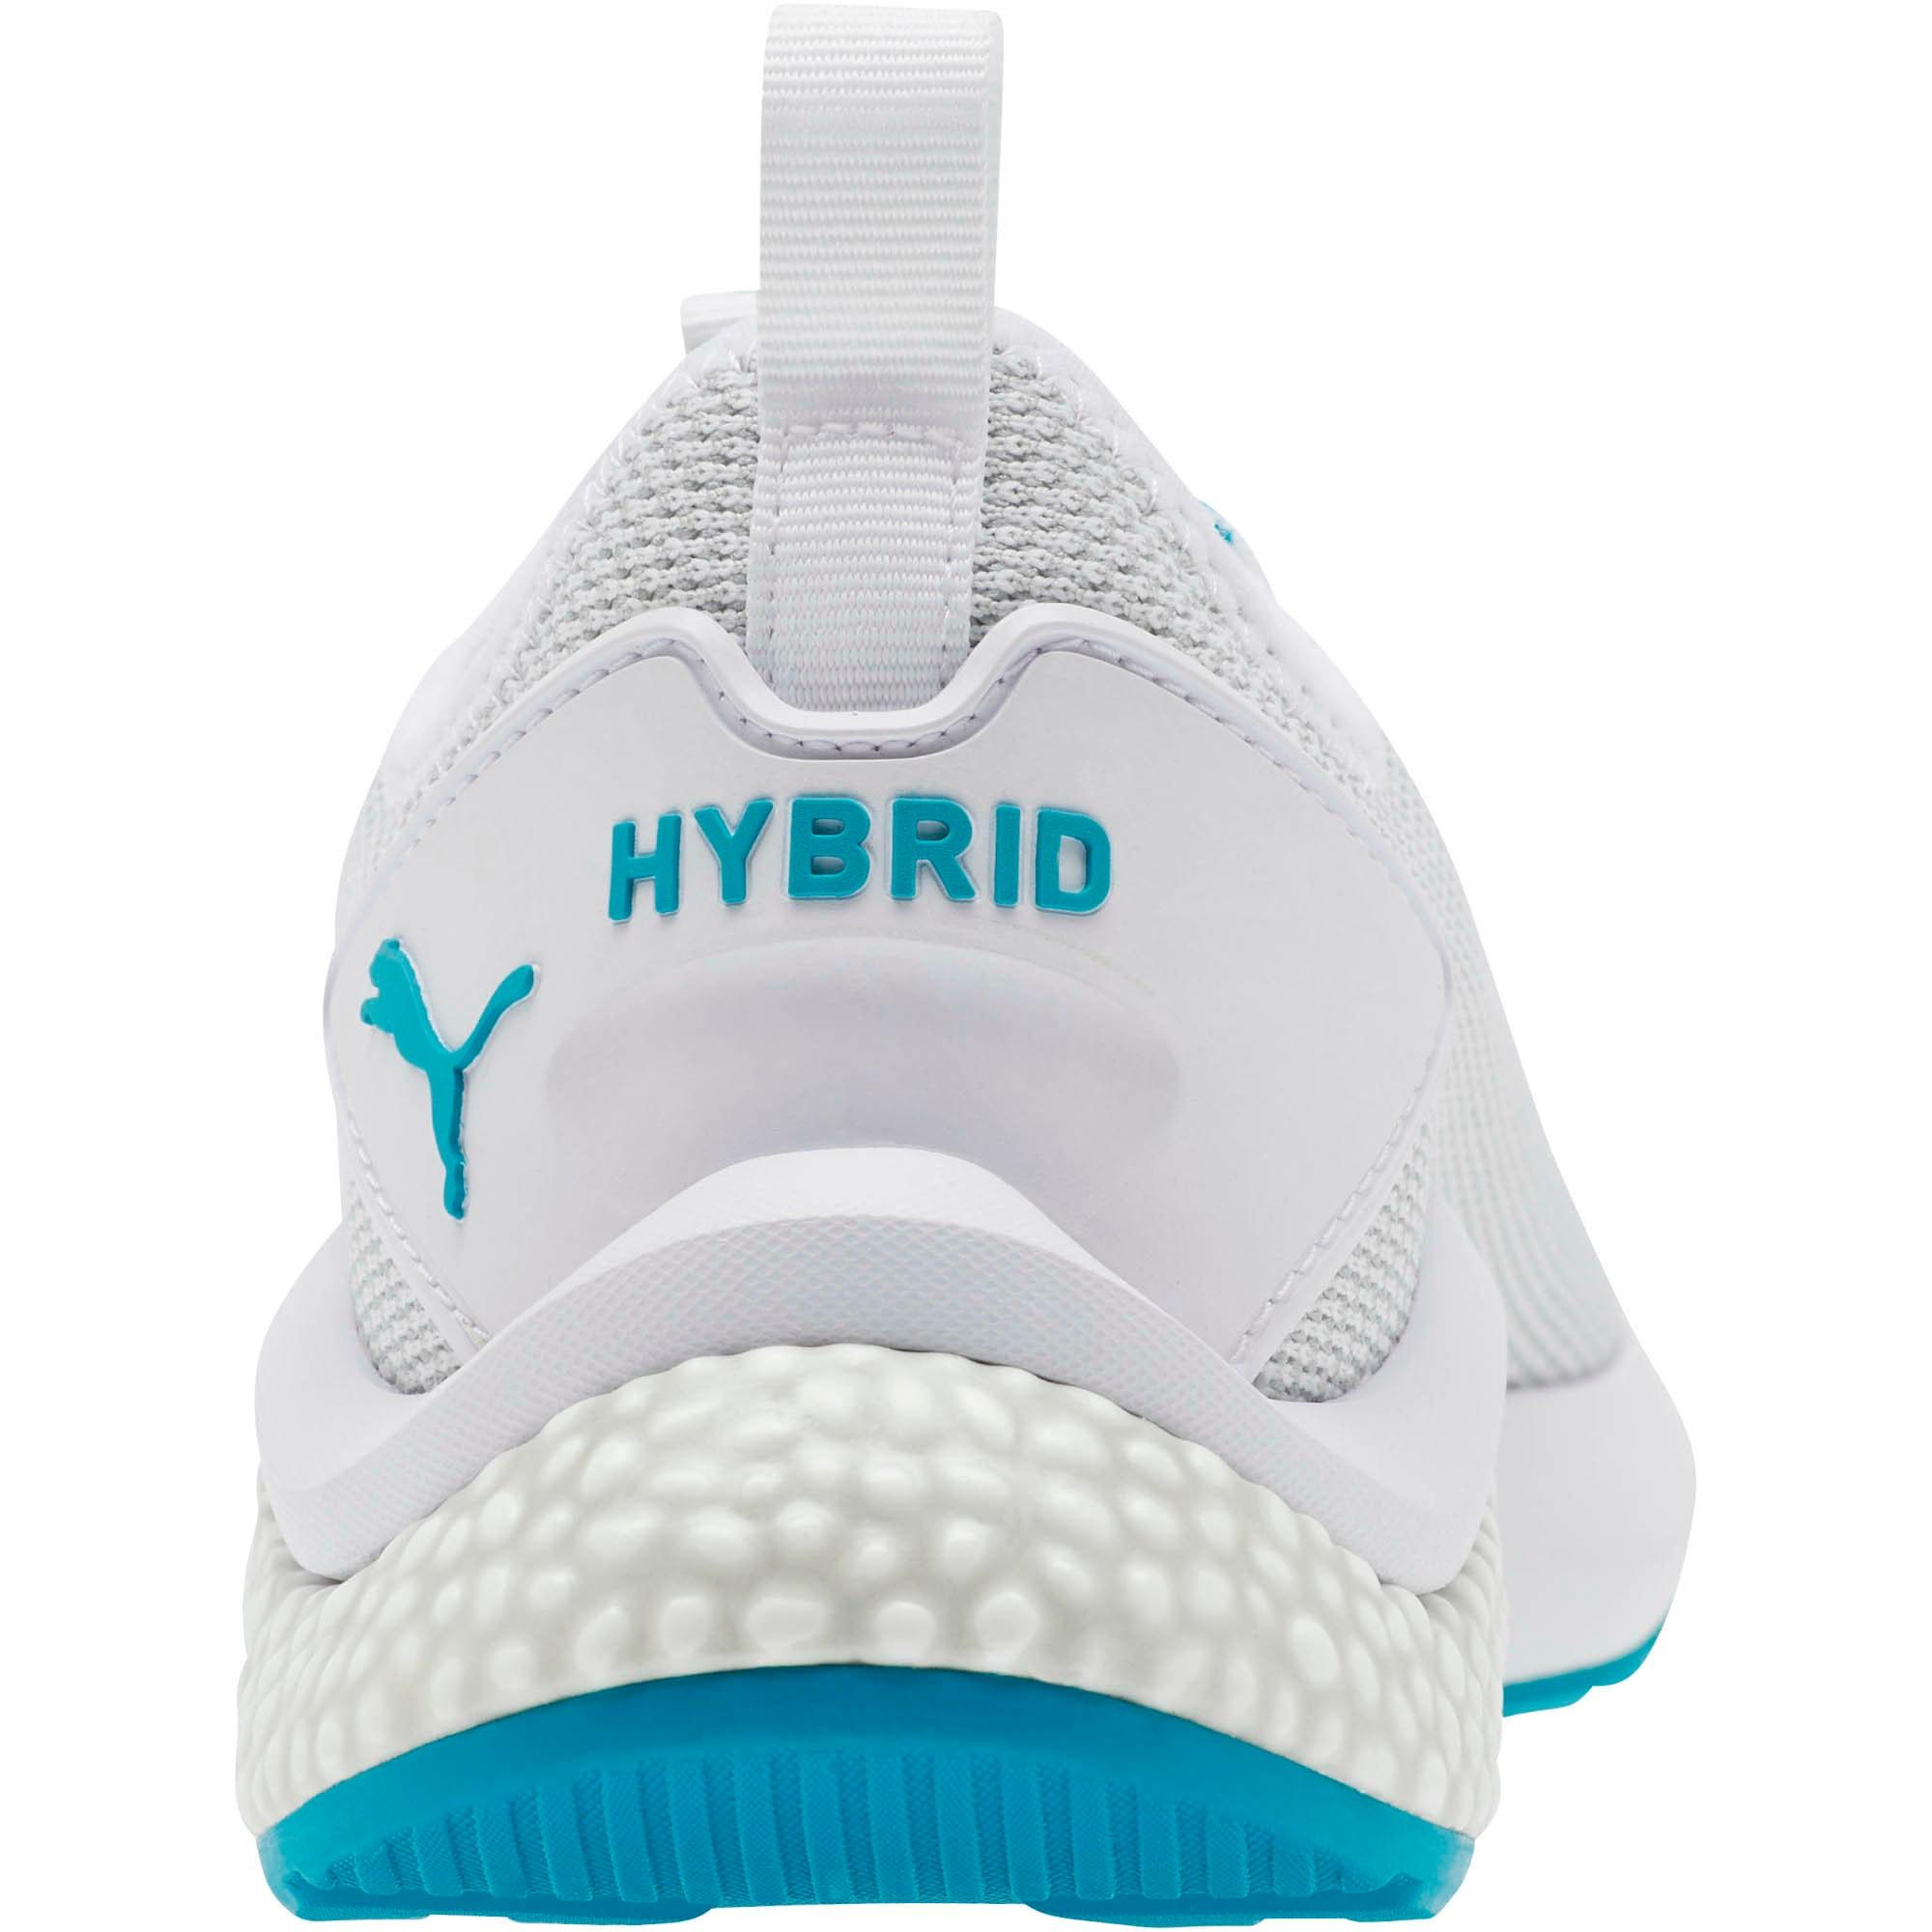 Thumbnail 3 of HYBRID NX Women's Running Shoes, Puma White-Caribbean Sea, medium